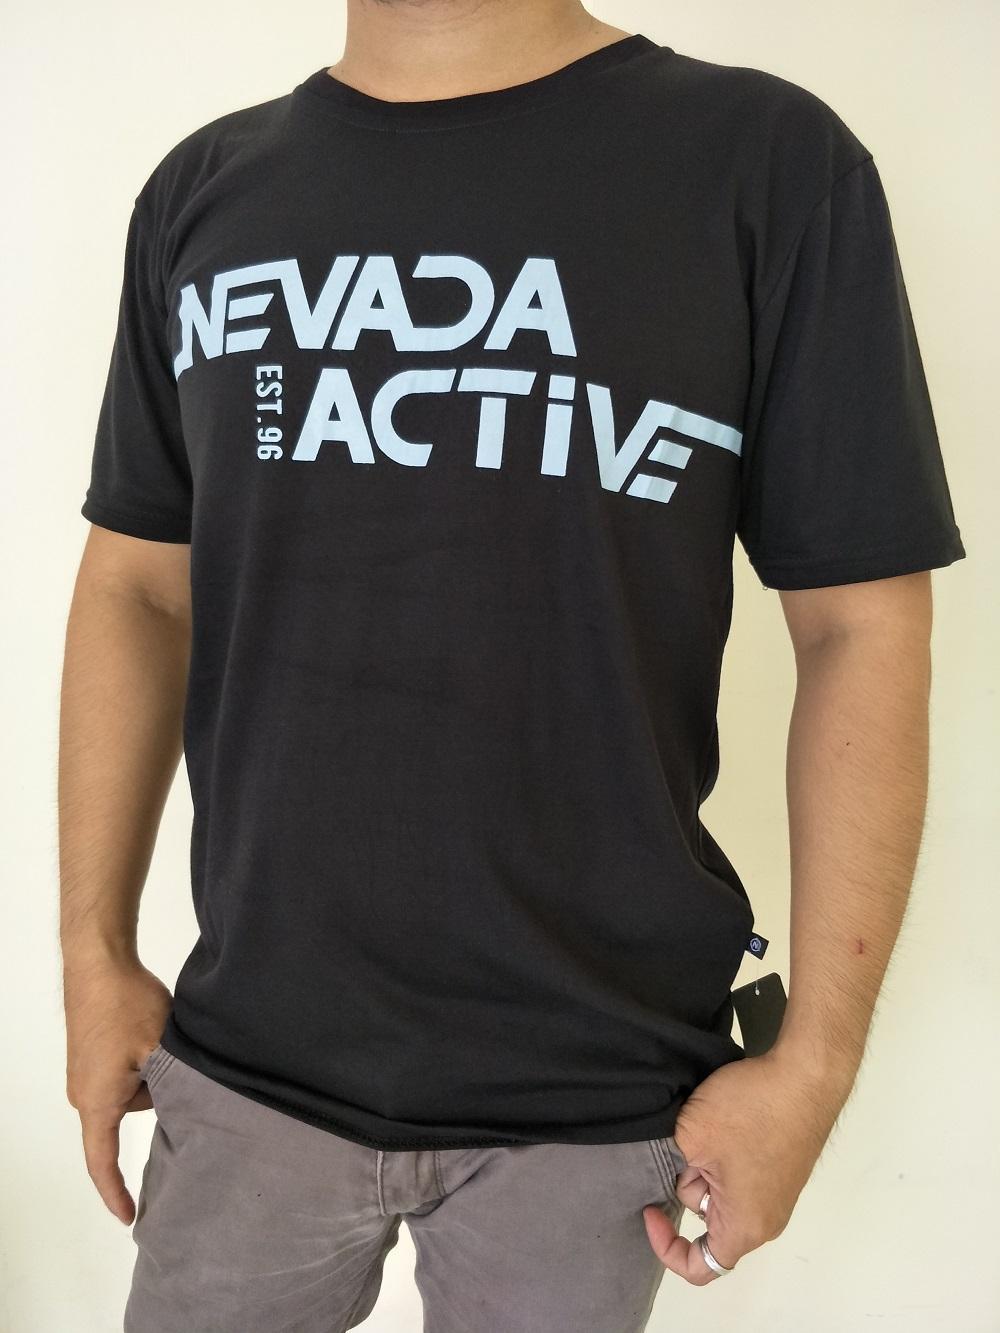 224 Kaos distro Nevada premium Quality TSHIRT PRIA / RAGLAN / KAOS PRIA / KAOS BRANDED ORIGINAL MATAHARI